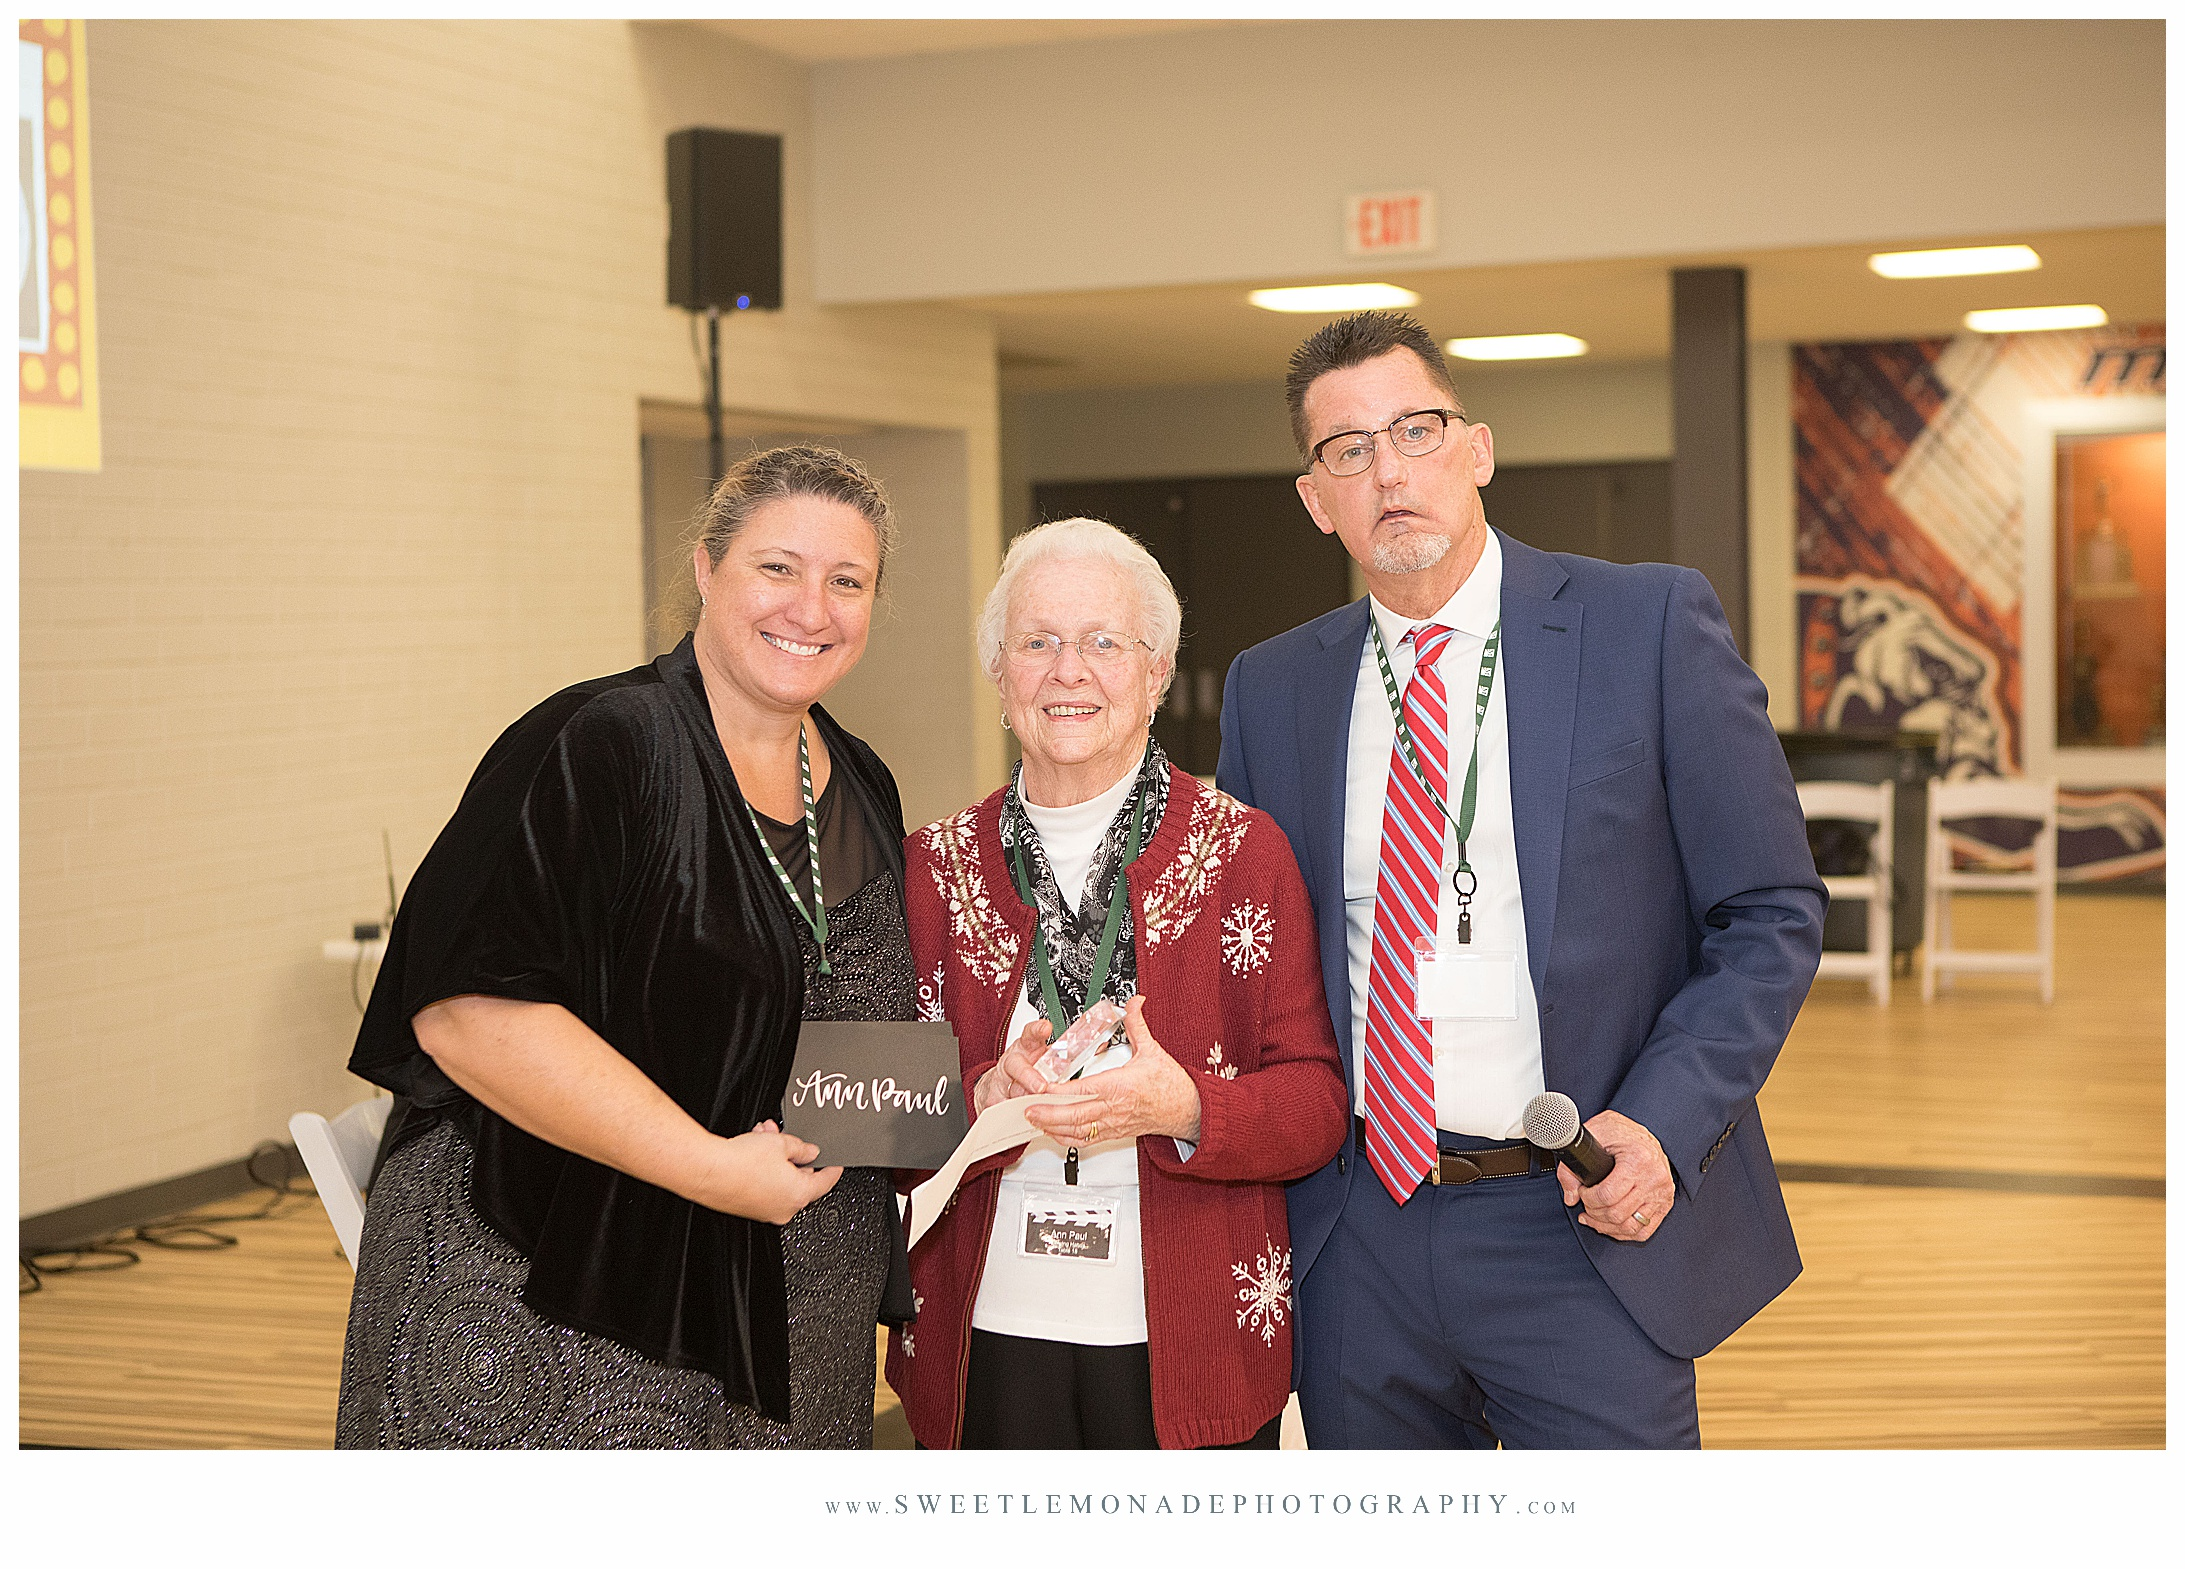 champaign-illinois-senior-photographer-chamber-awards ceremony_2382.jpg